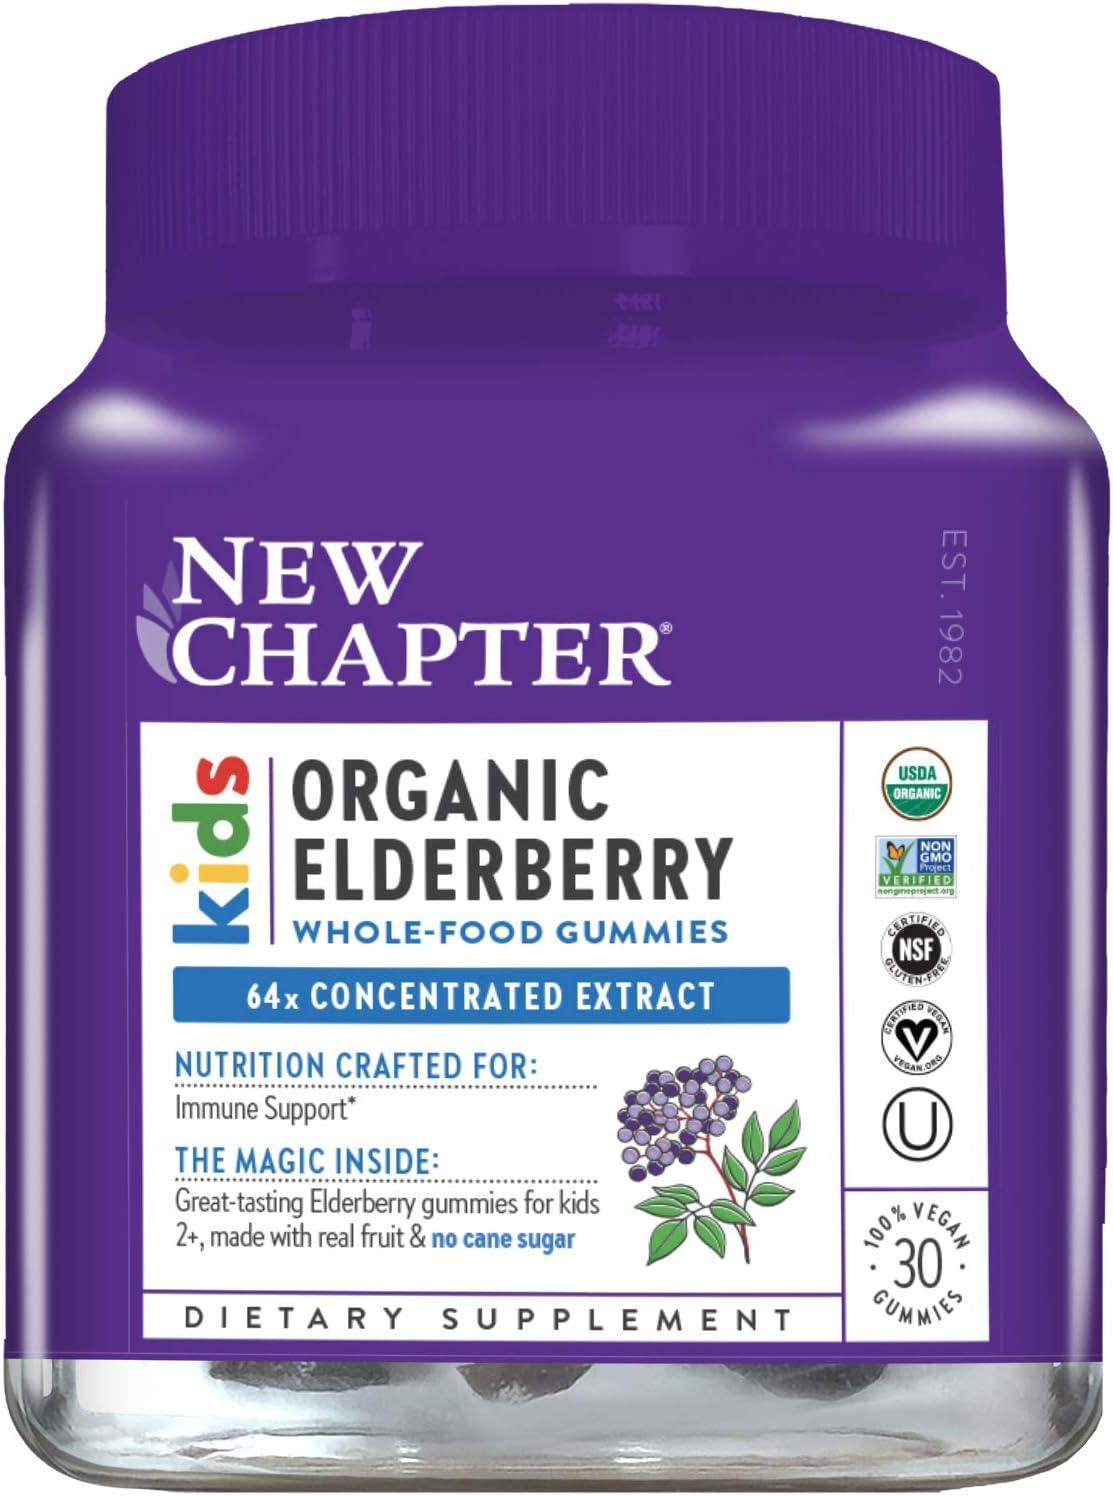 New Chapter Elderberry Gummies for Kids- Kids Organic Elderberry Whole-Food Gummies for Immune Support + Great Tasting- 30 ct